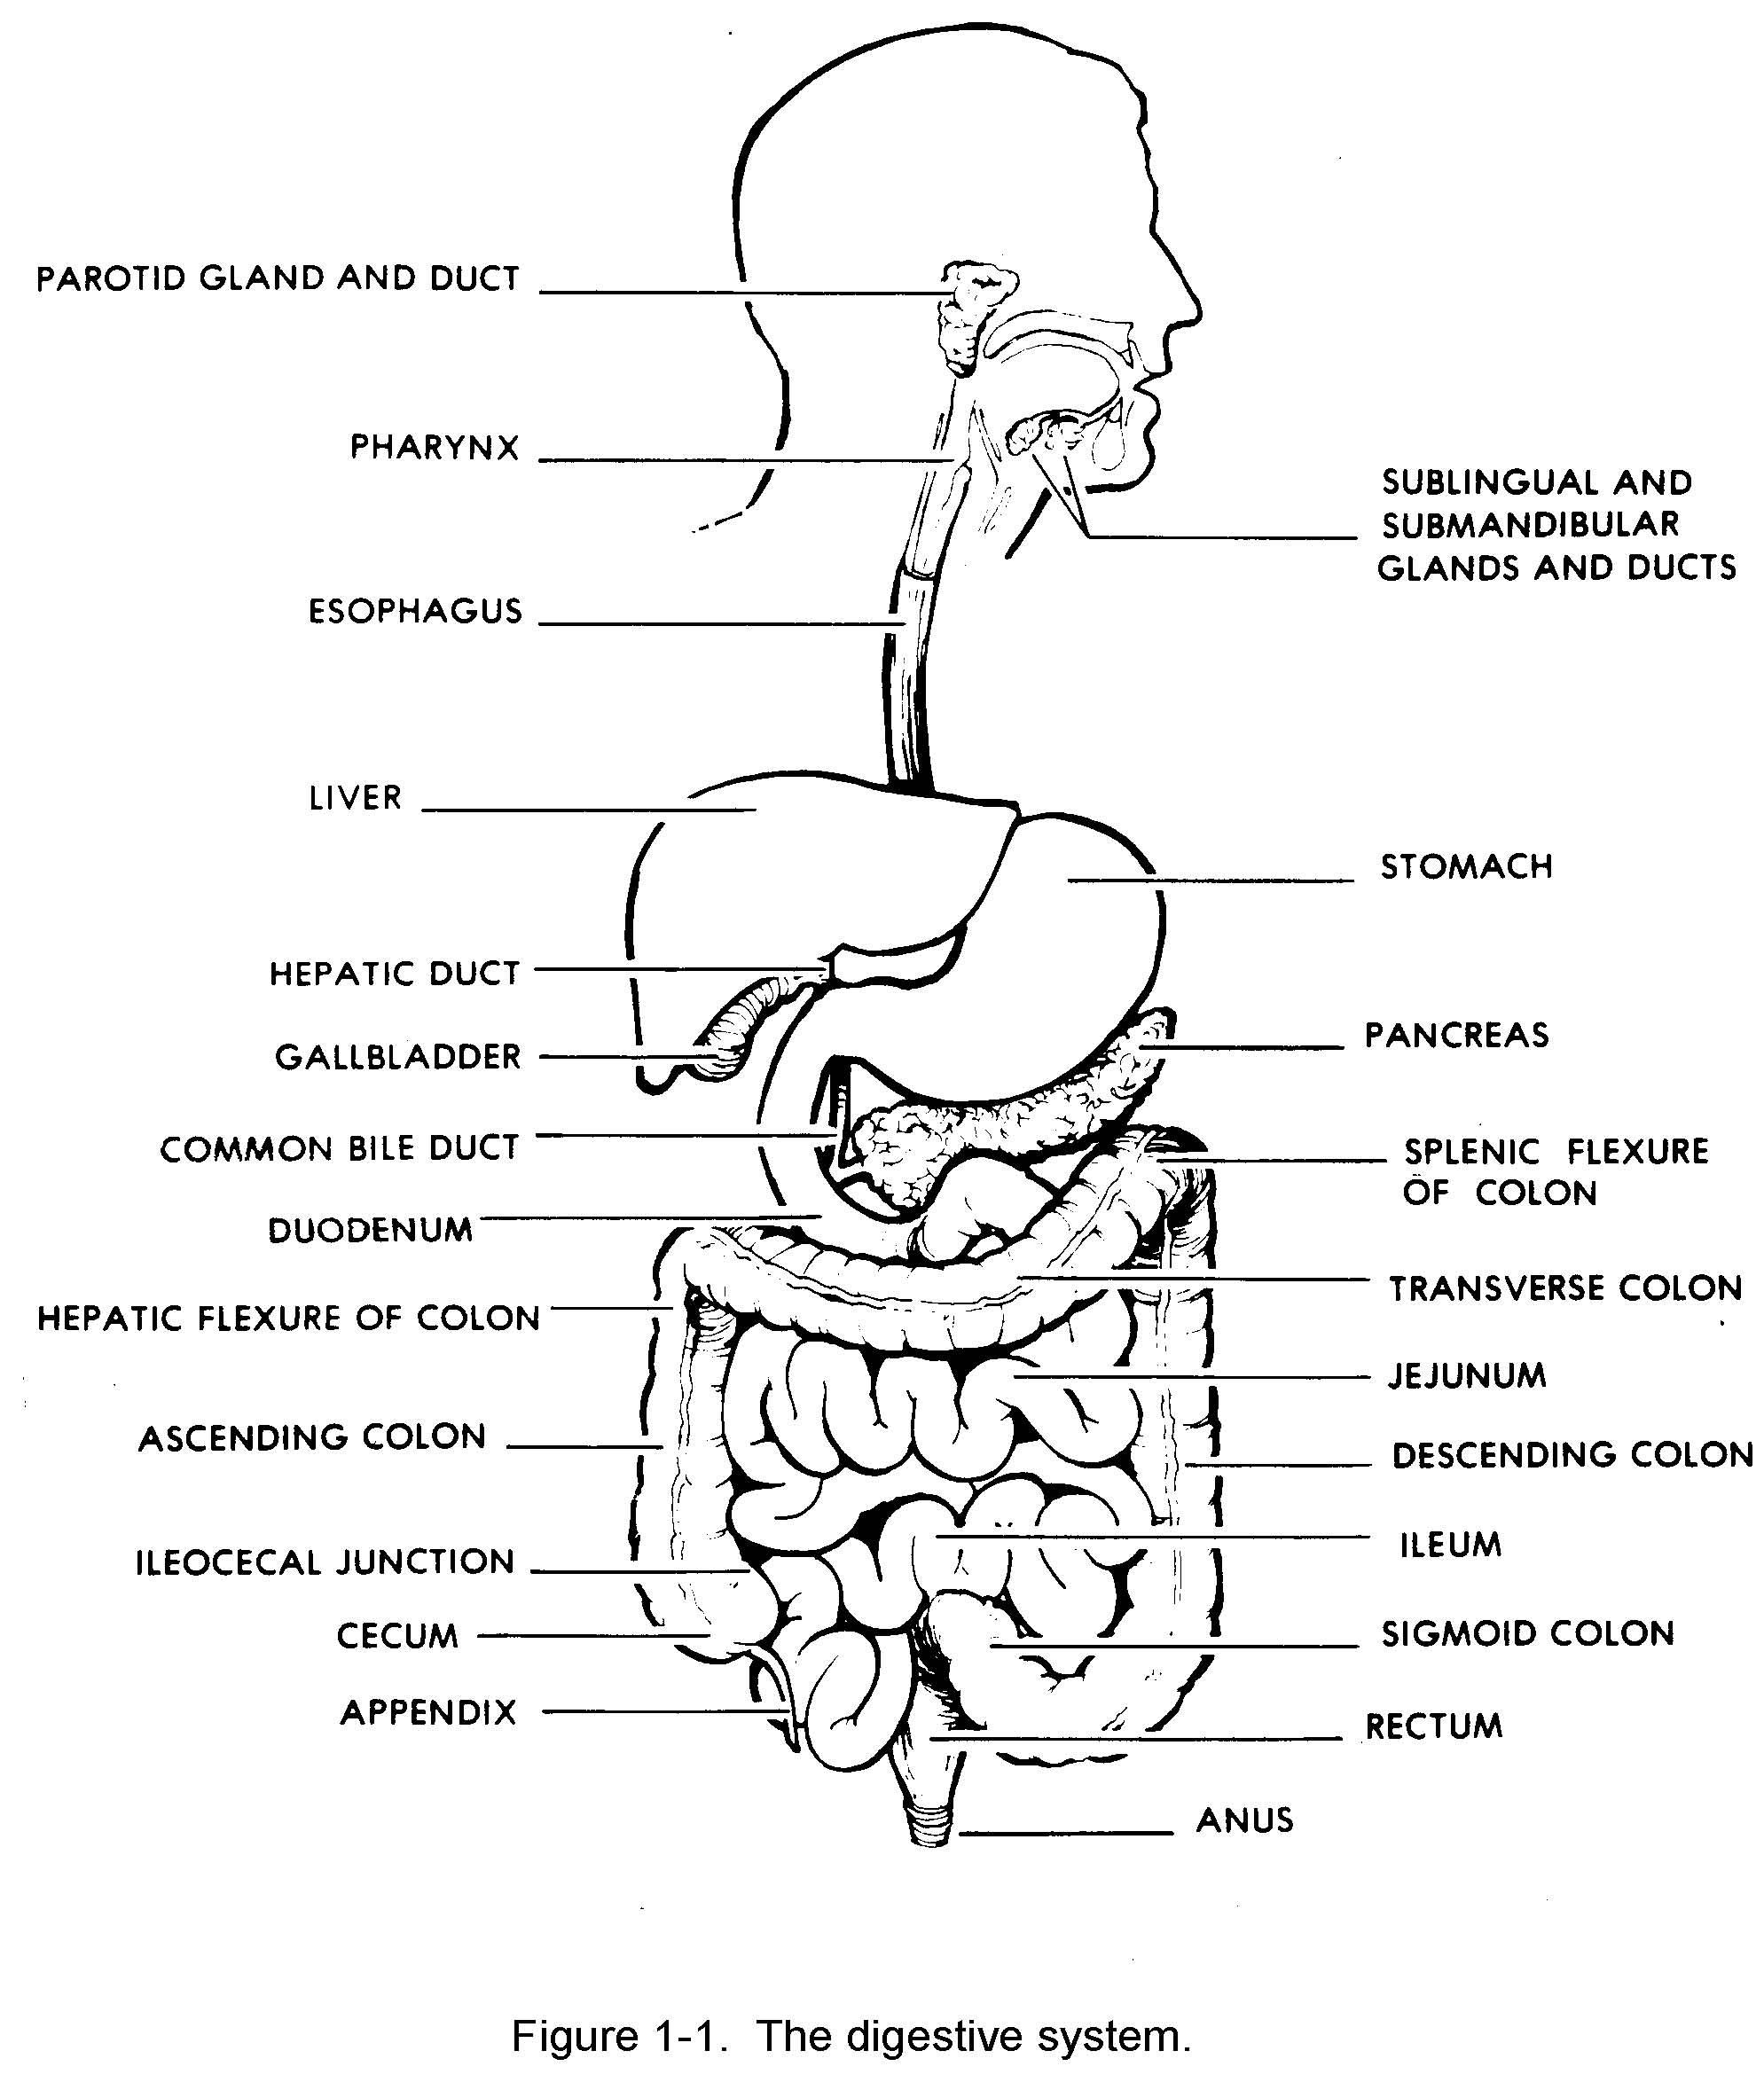 earthworm diagram worksheet foxtel satellite wiring images 06 digestive system basic human anatomy